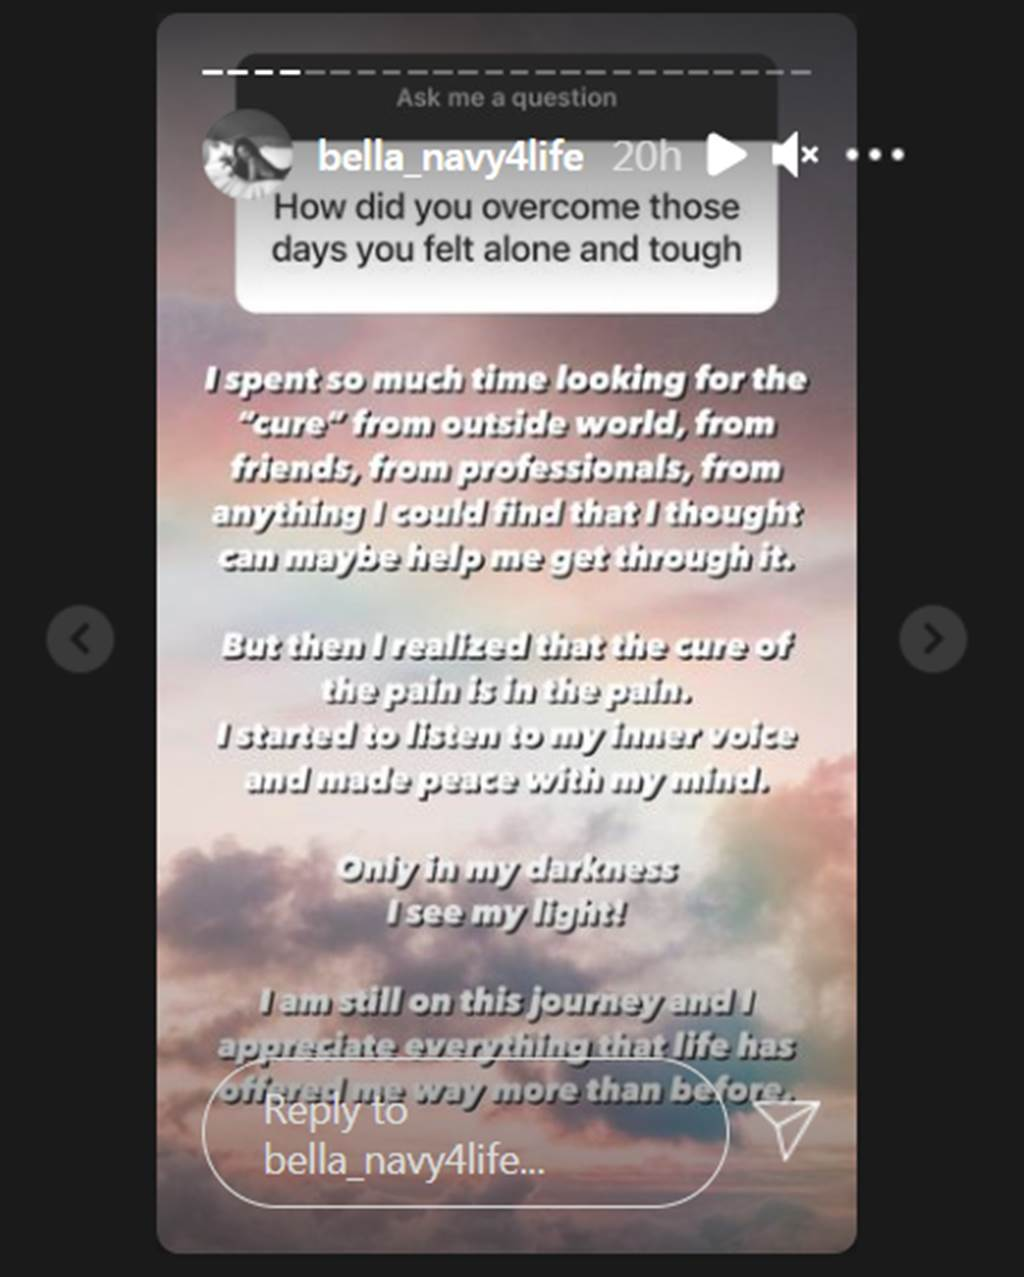 Bella在限時動態接受網友提問每。(圖/bella_navy4life IG)